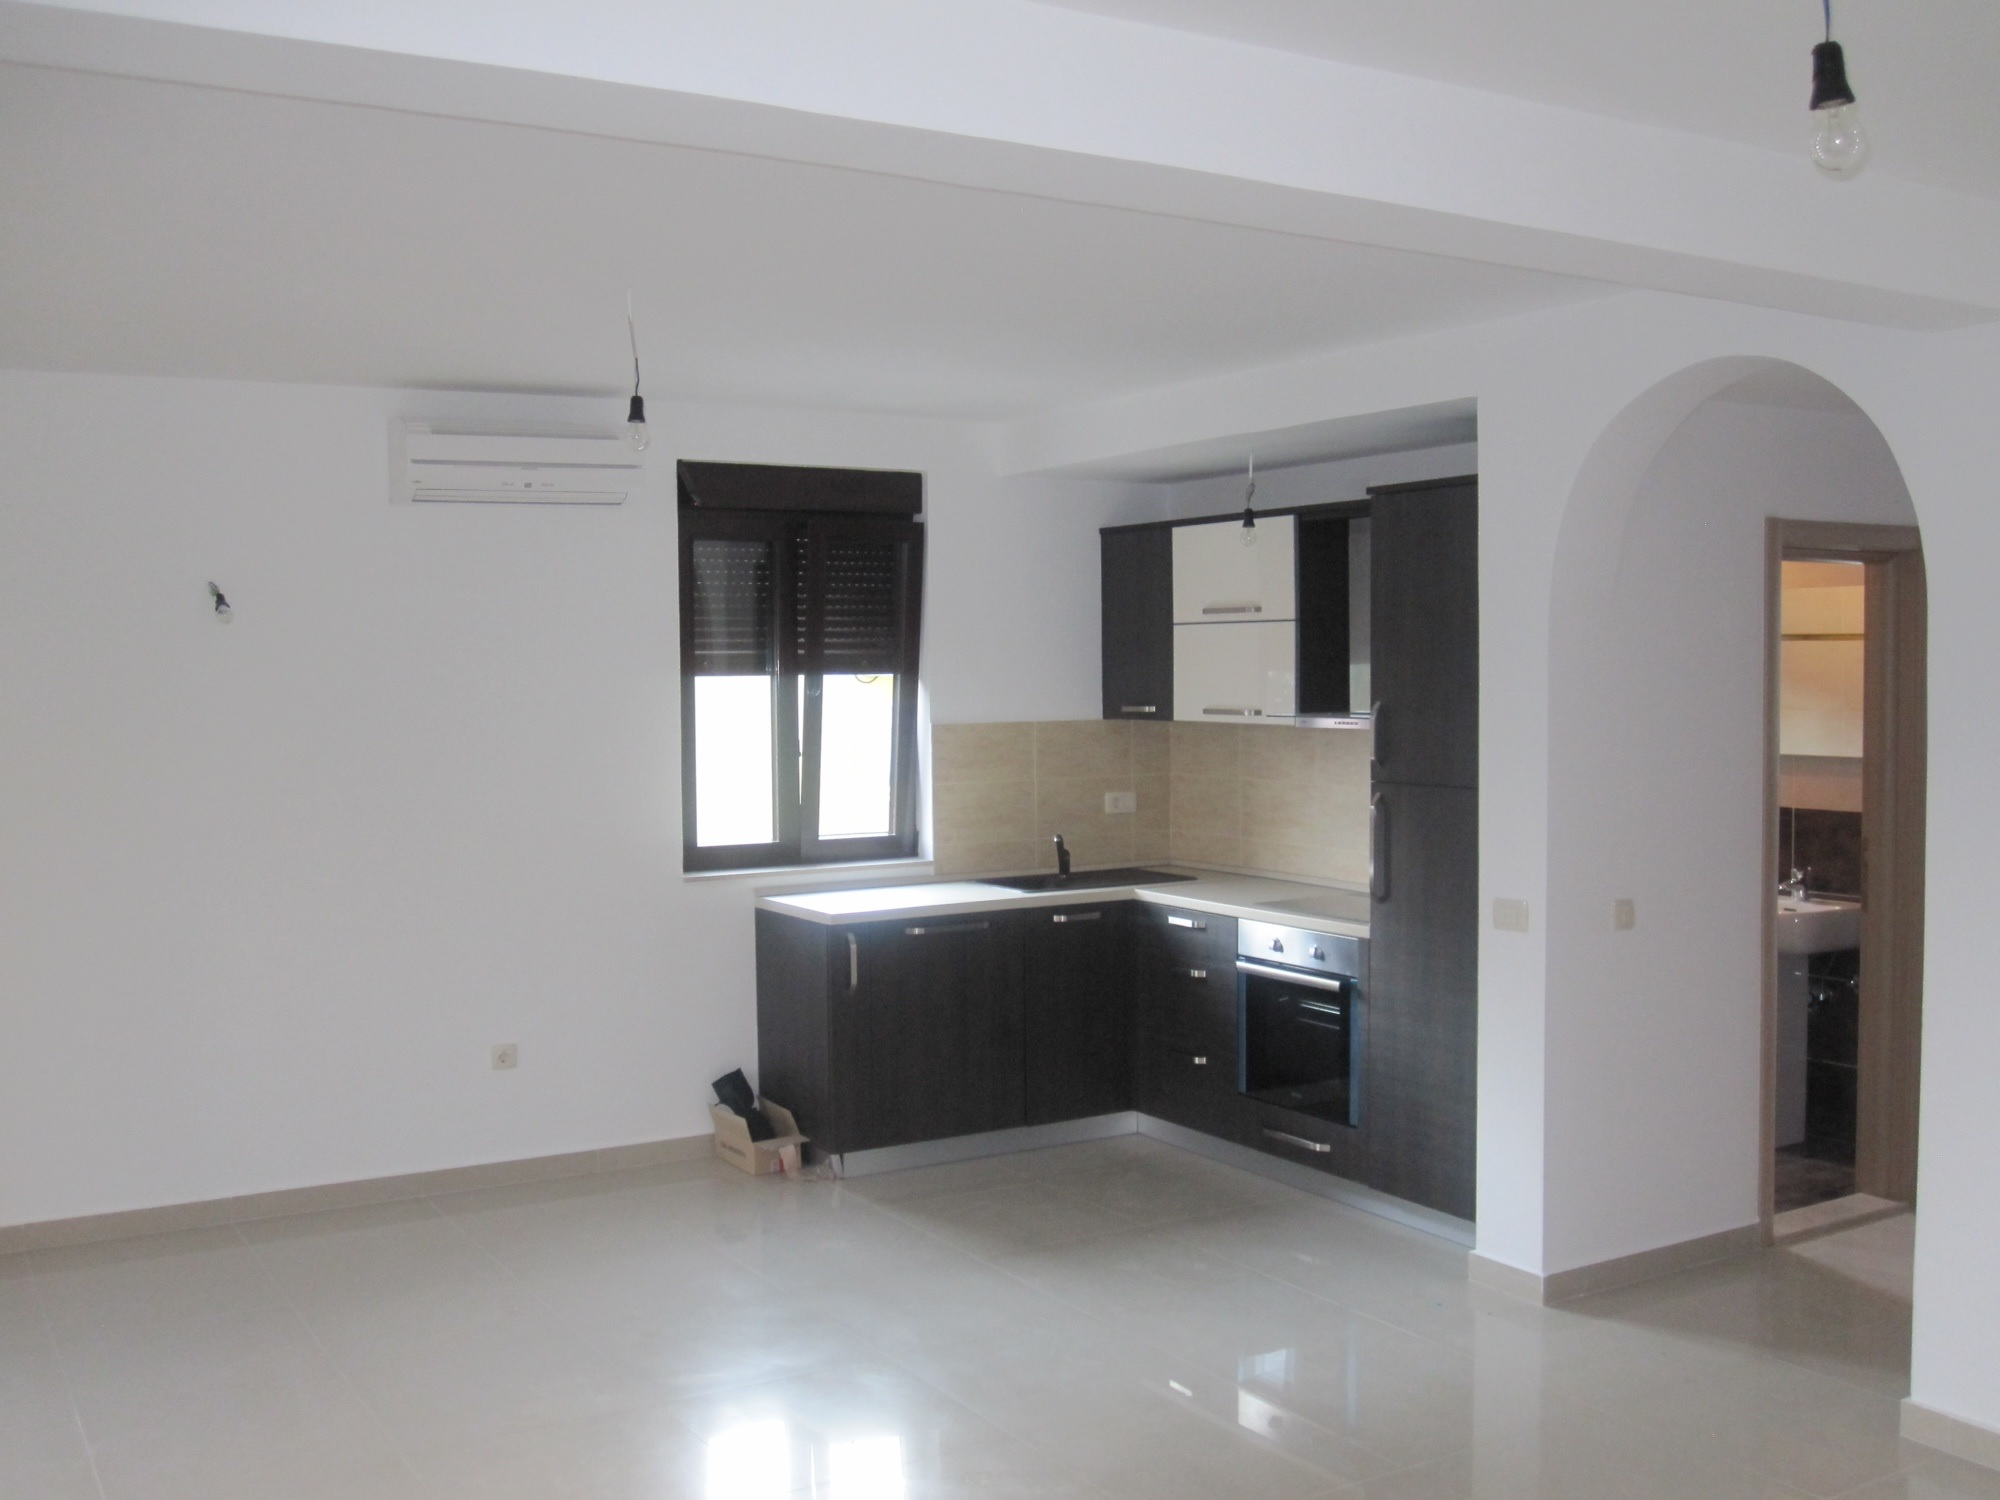 Апартамент в Боко-Которской бухте